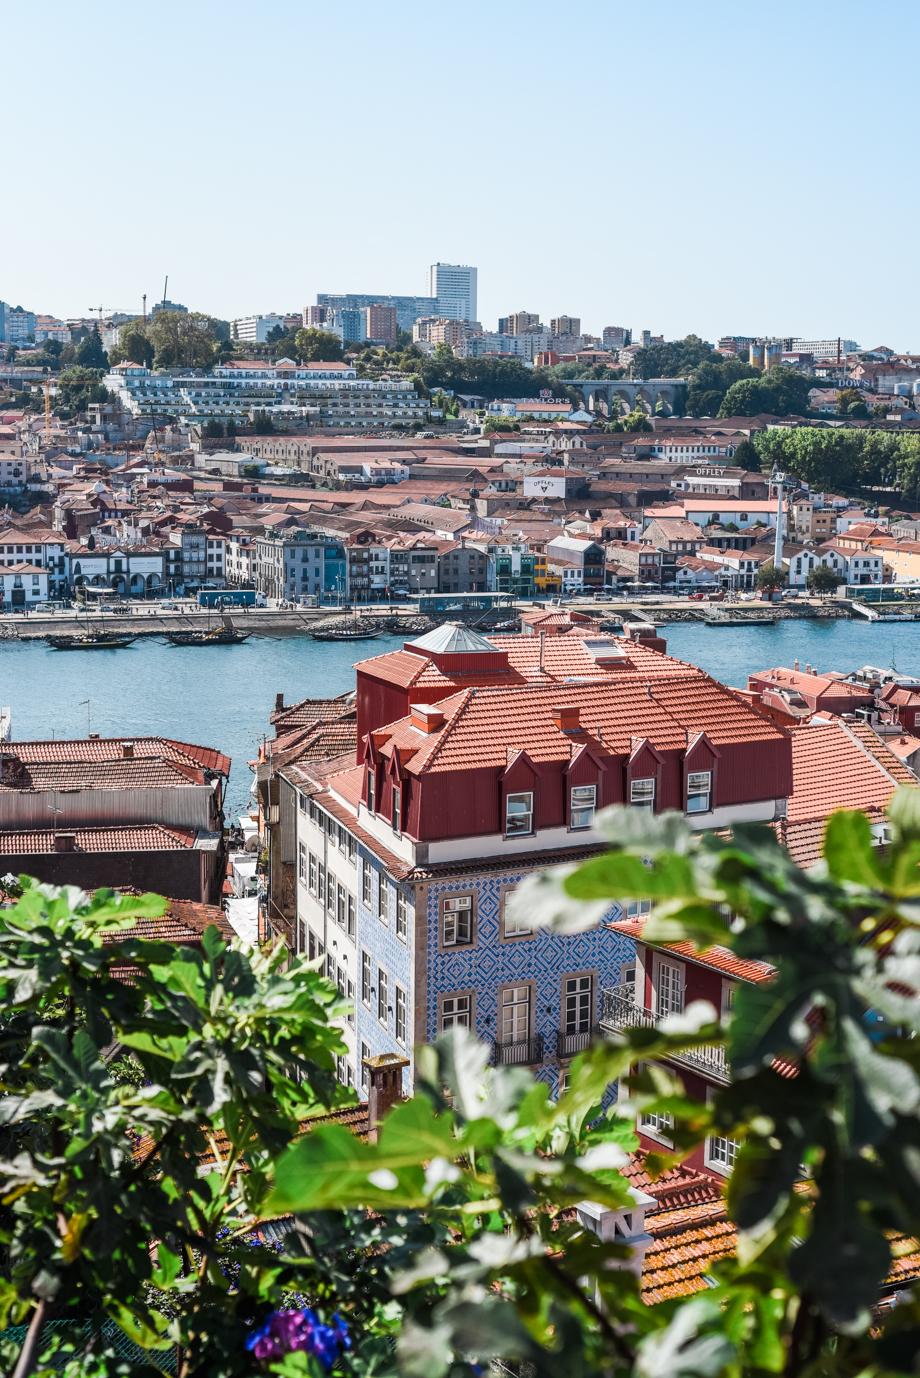 WebQuality-Porto-10yearsVentigrate-AnaisStoelenPhotography-133.jpg